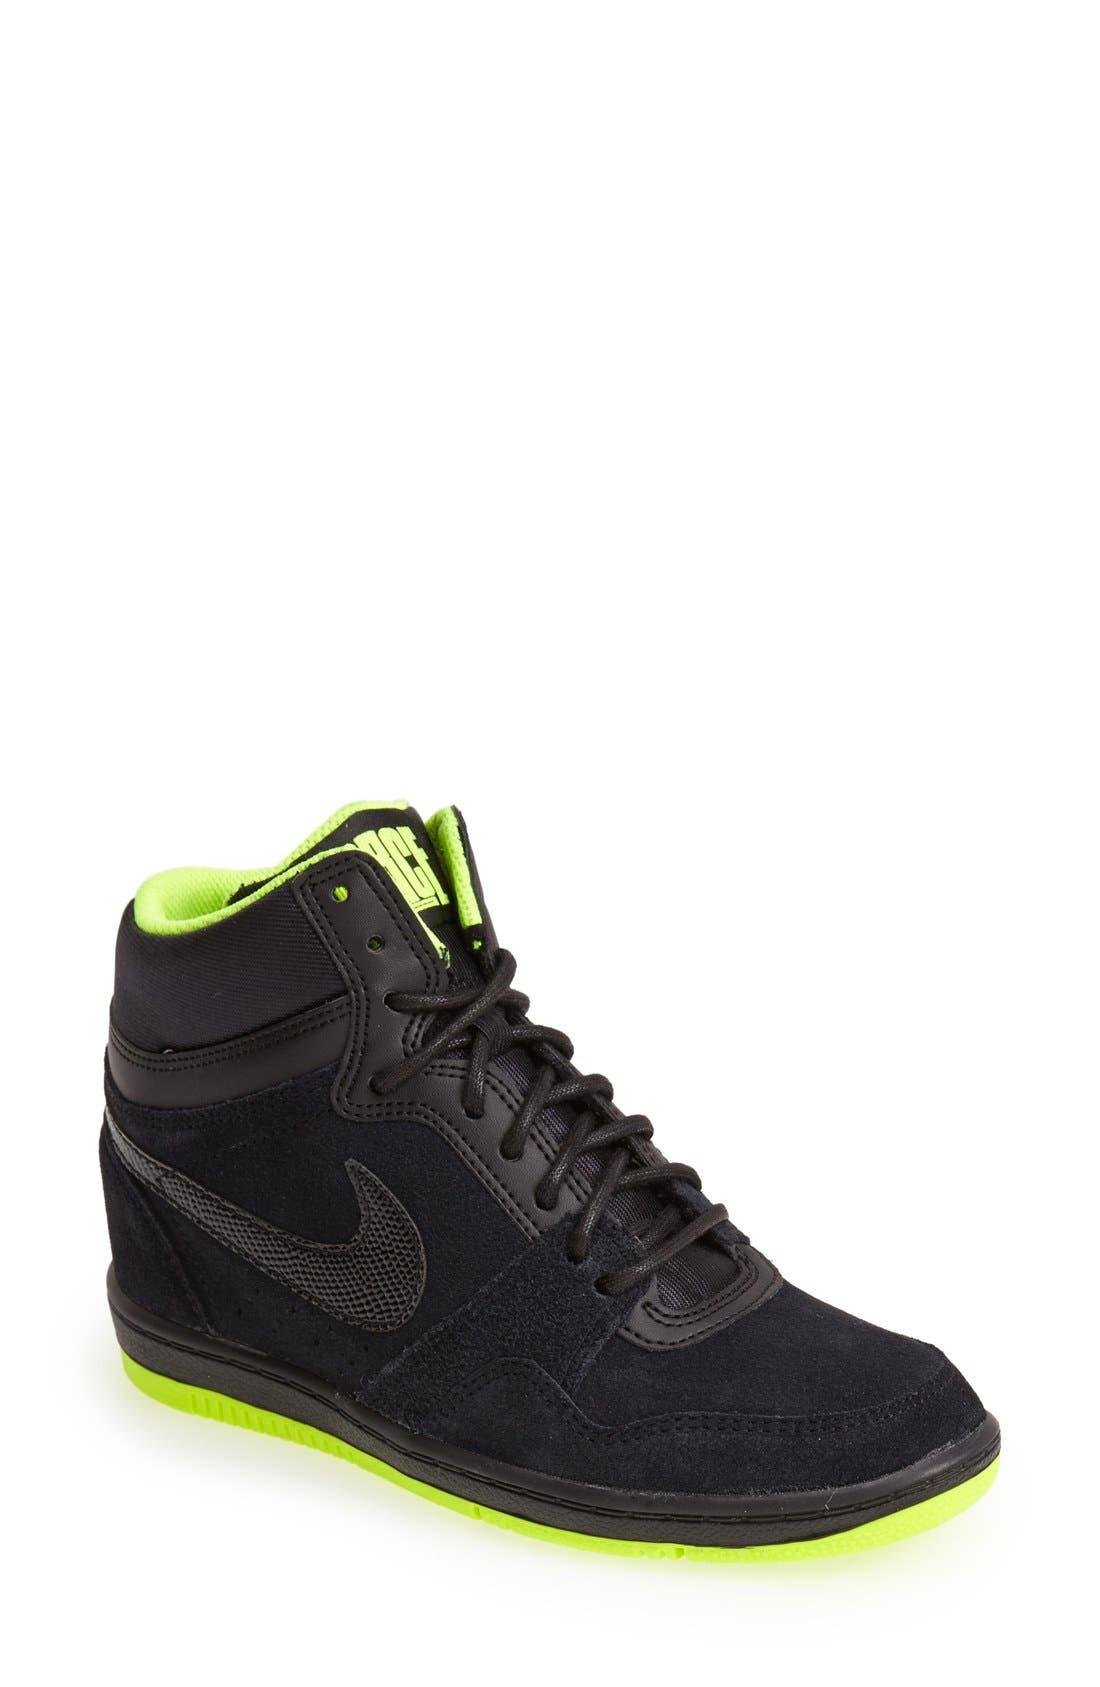 Alternate Image 1 Selected - Nike 'Force Sky High' Sneaker (Women)